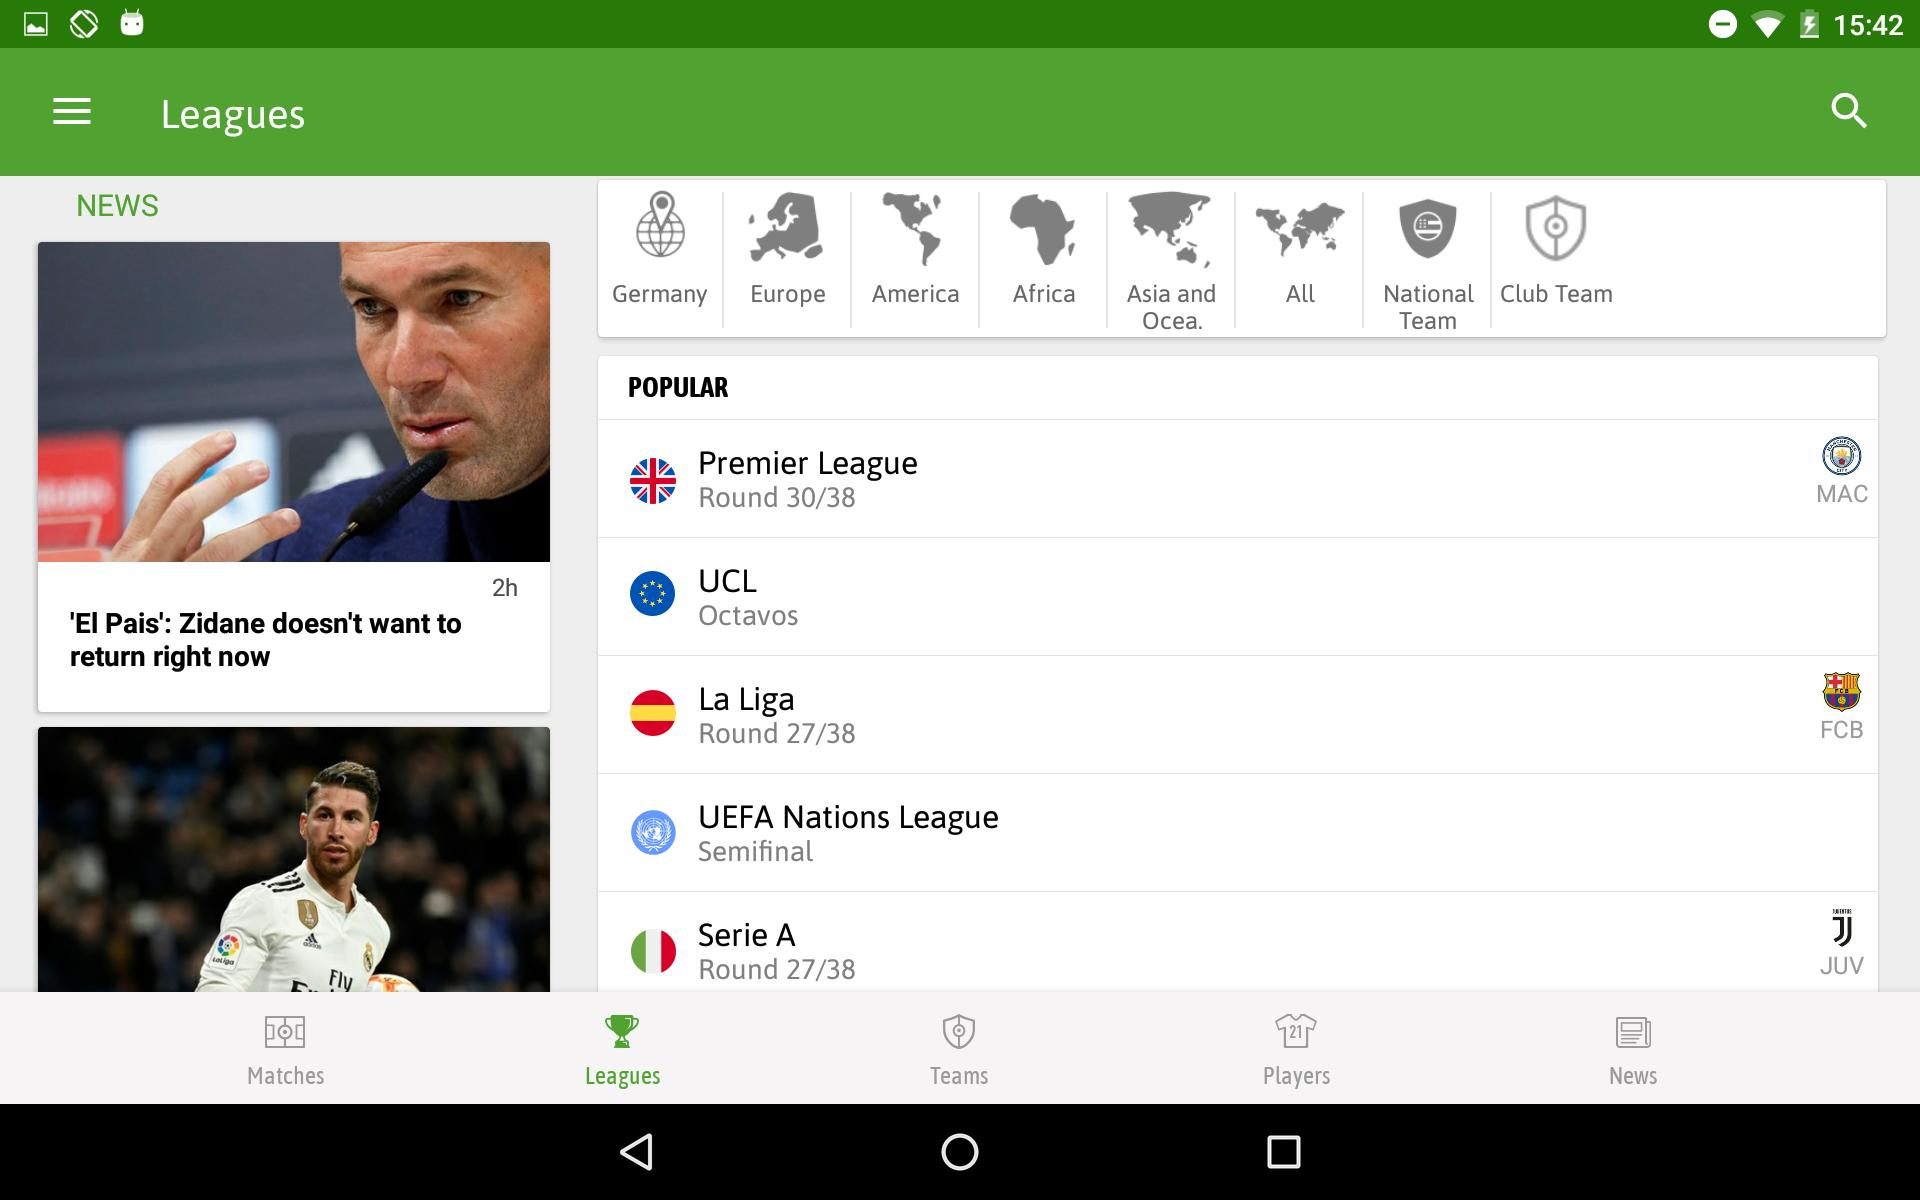 BeSoccer Soccer Live Score 5.2.2.1 Screenshot 14